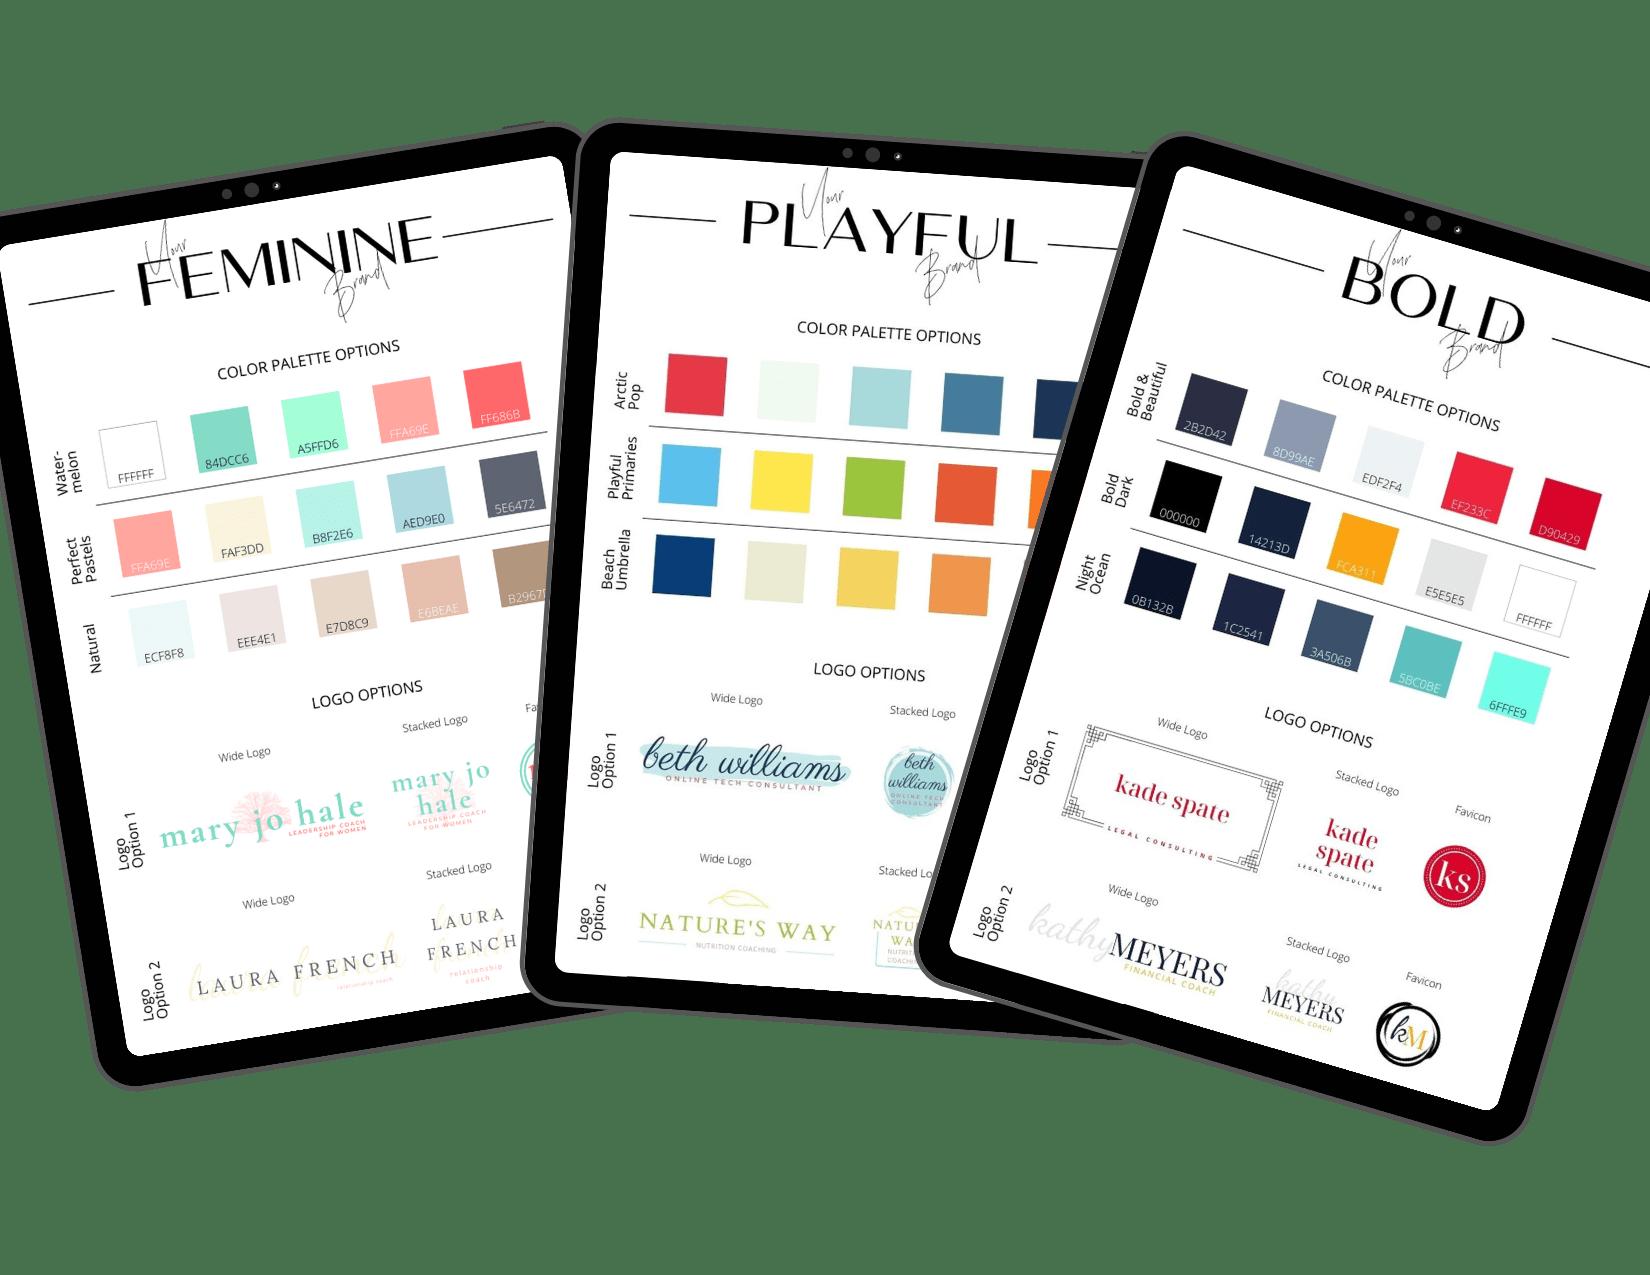 Brand Kits help you create a beautiful brand easily